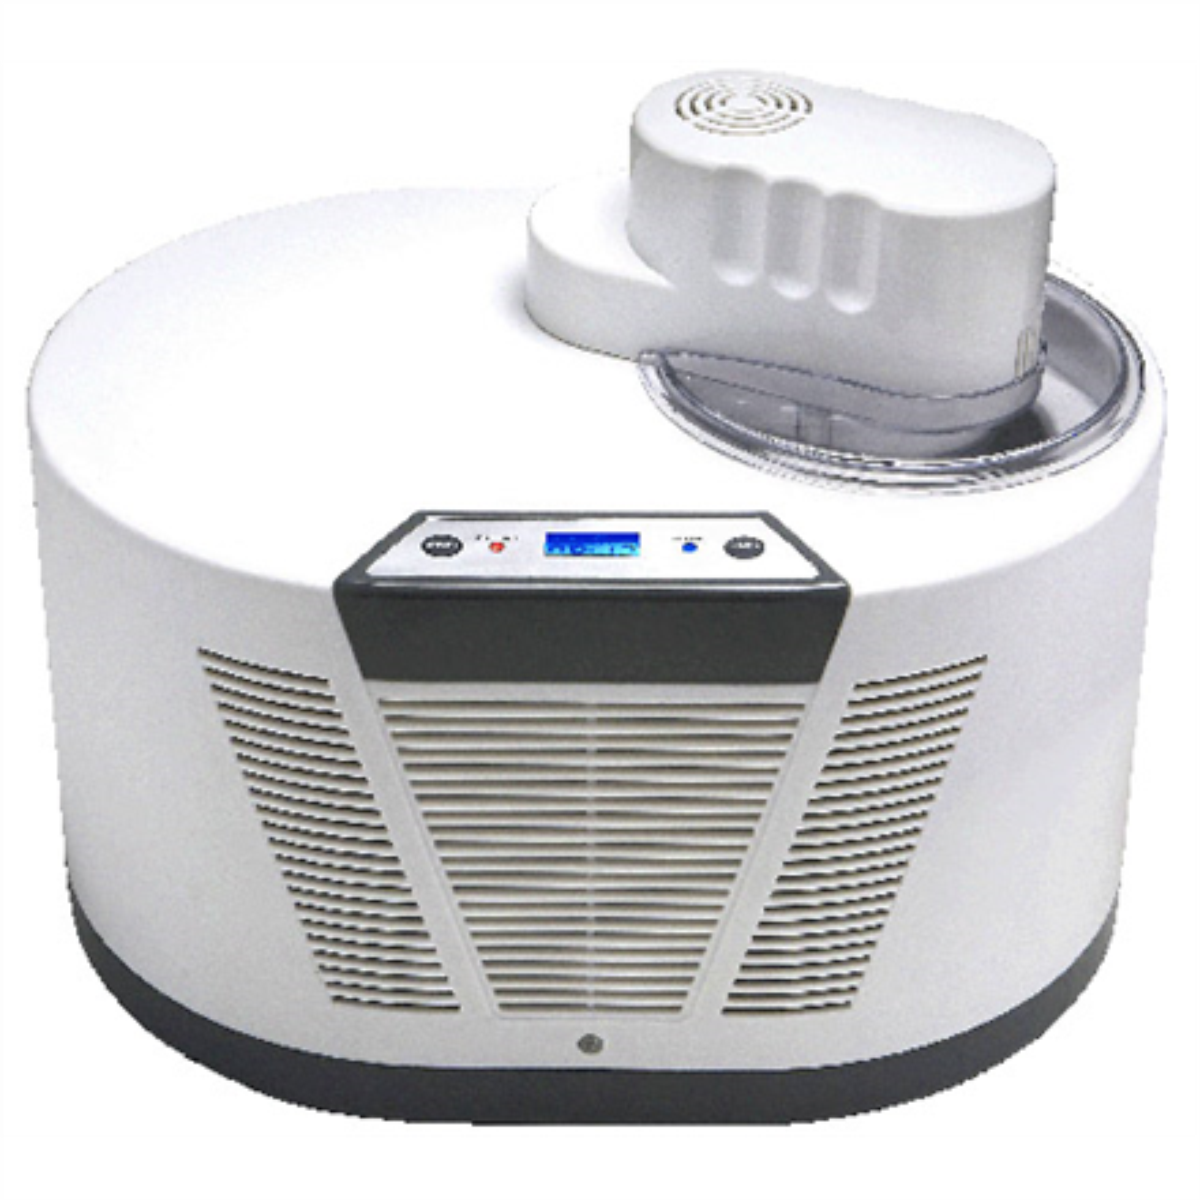 Camry CR 4460 Ice cream maker with compressor, Capacity 1L, Non-stick removable bowl Saldējuma mašīna